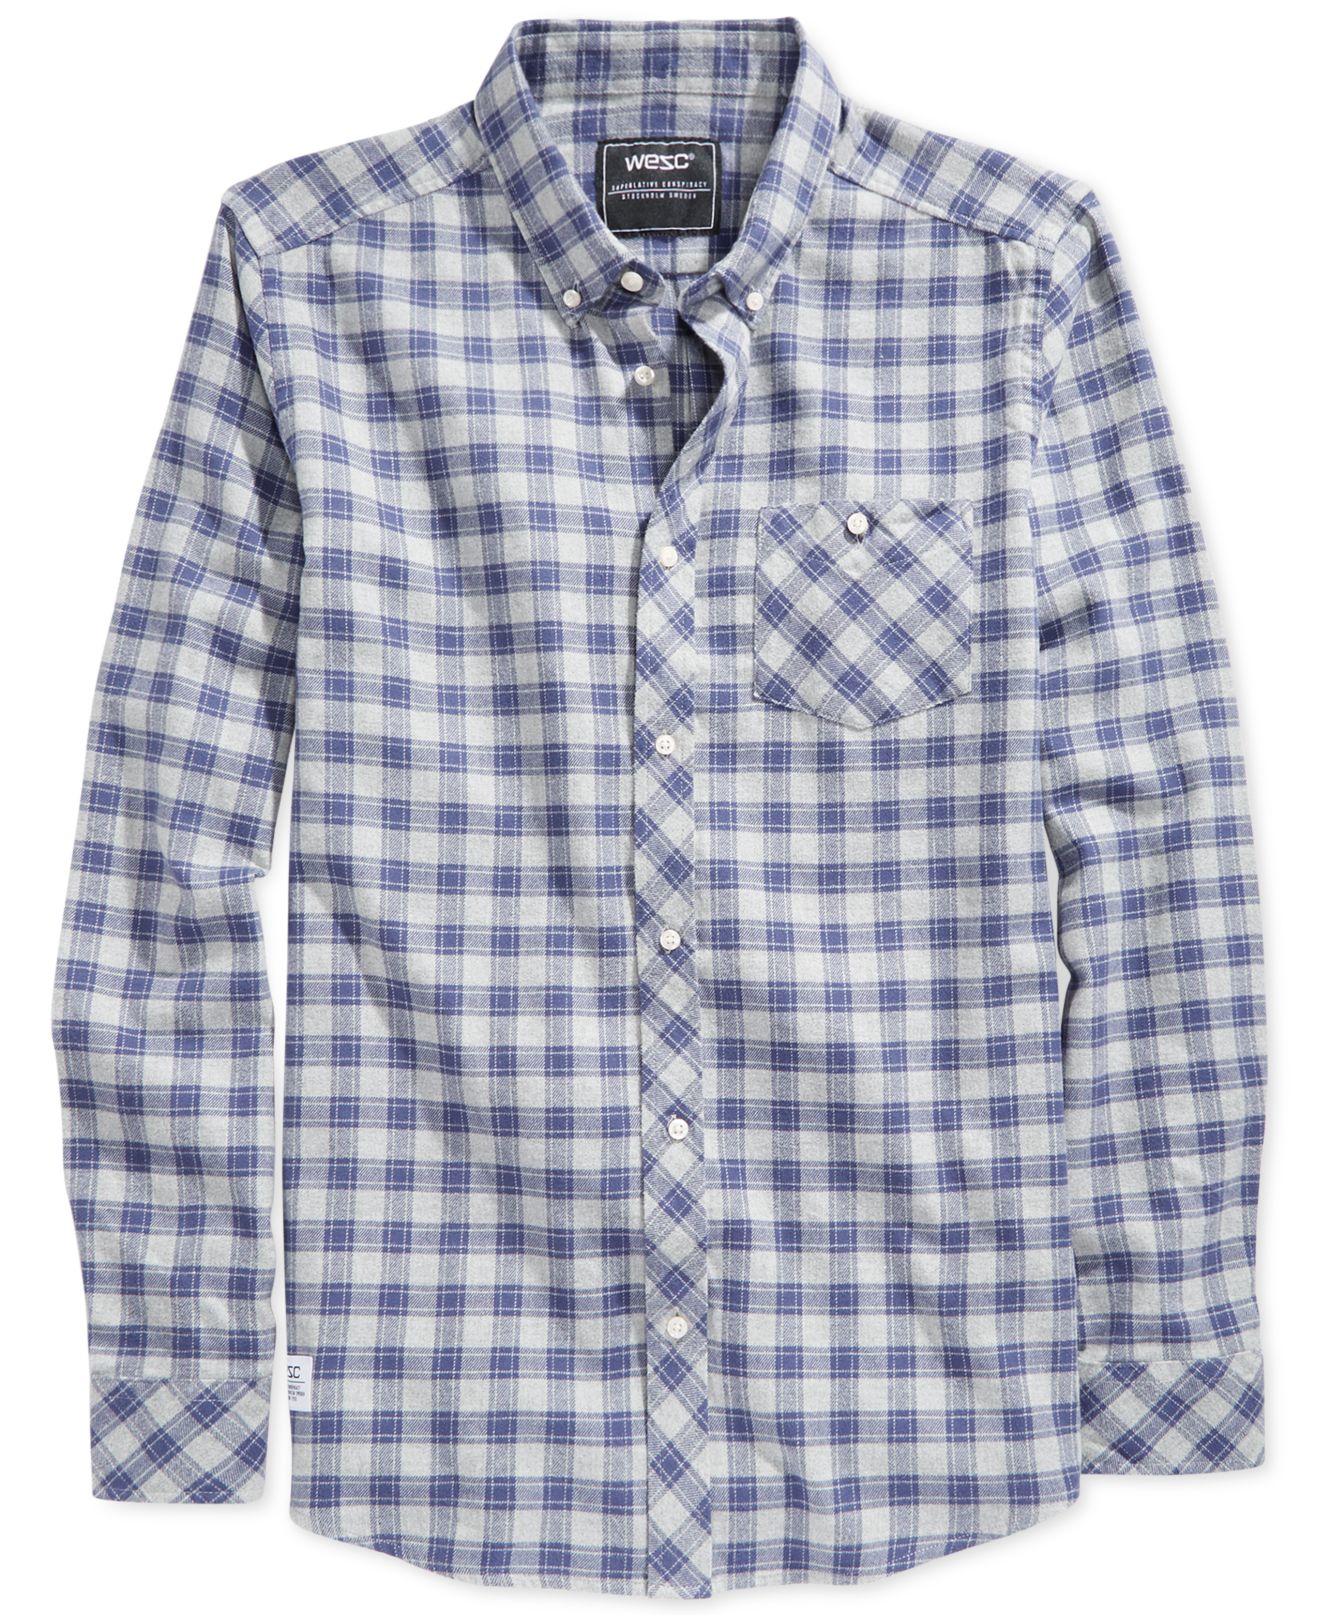 9fb9b3b50b6 Lyst - Wesc Pita Plaid Flannel Shirt in Blue for Men